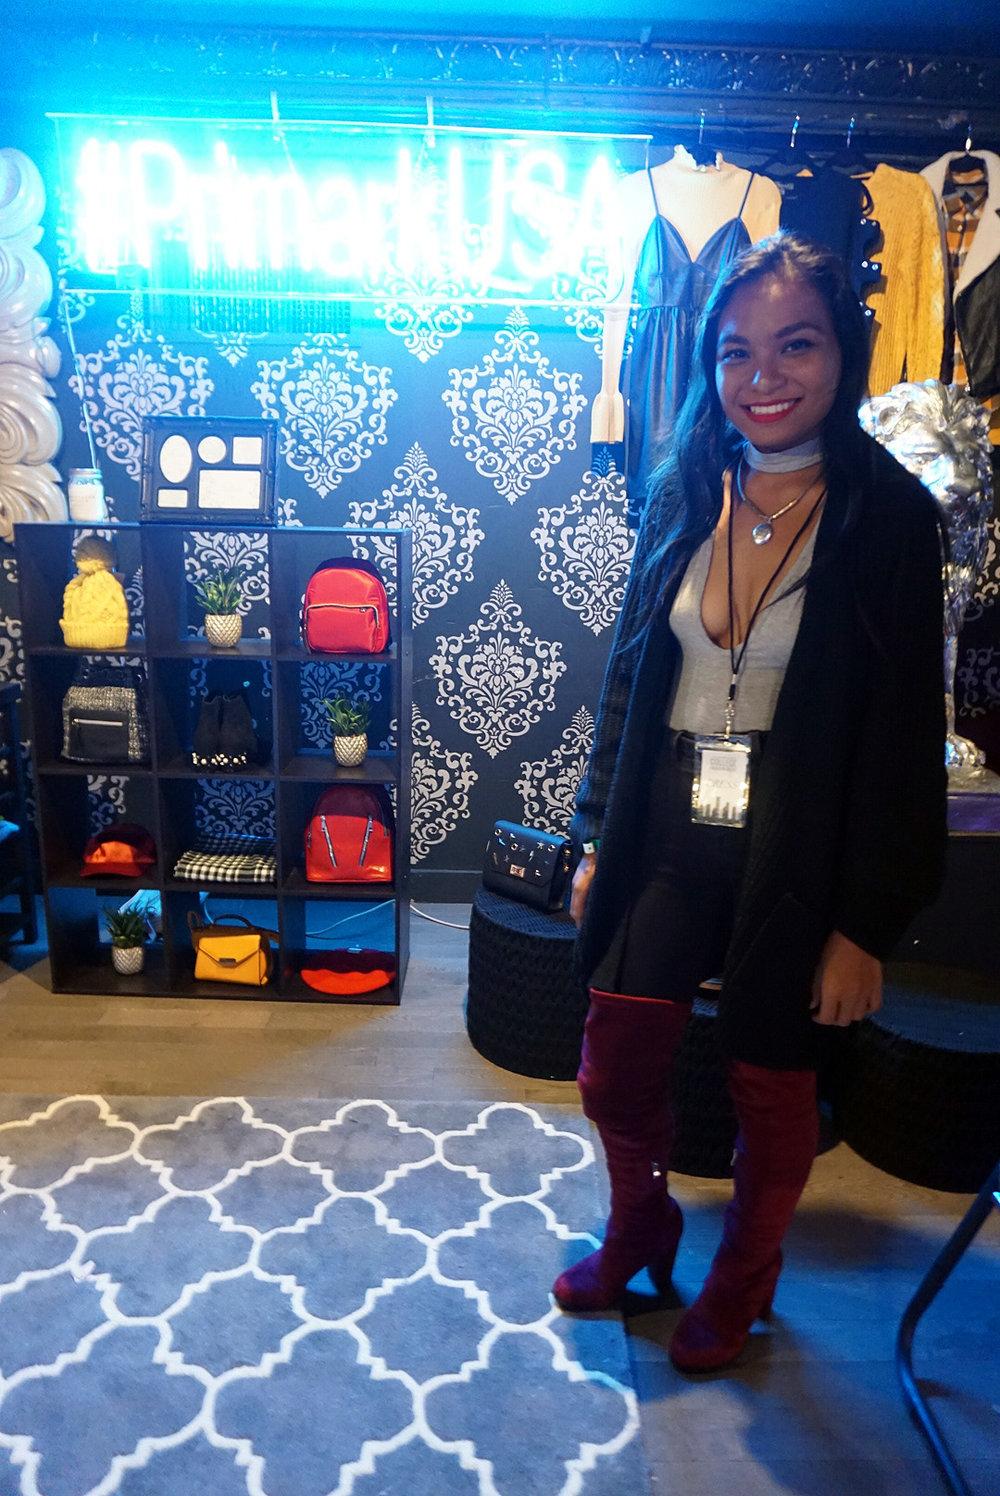 Boston-College-Fashion-Week-HerCampus-Primark-InfluencerHerCollective-Style-Blogger-LINDATENCHITRAN-27-1616x1080.jpg